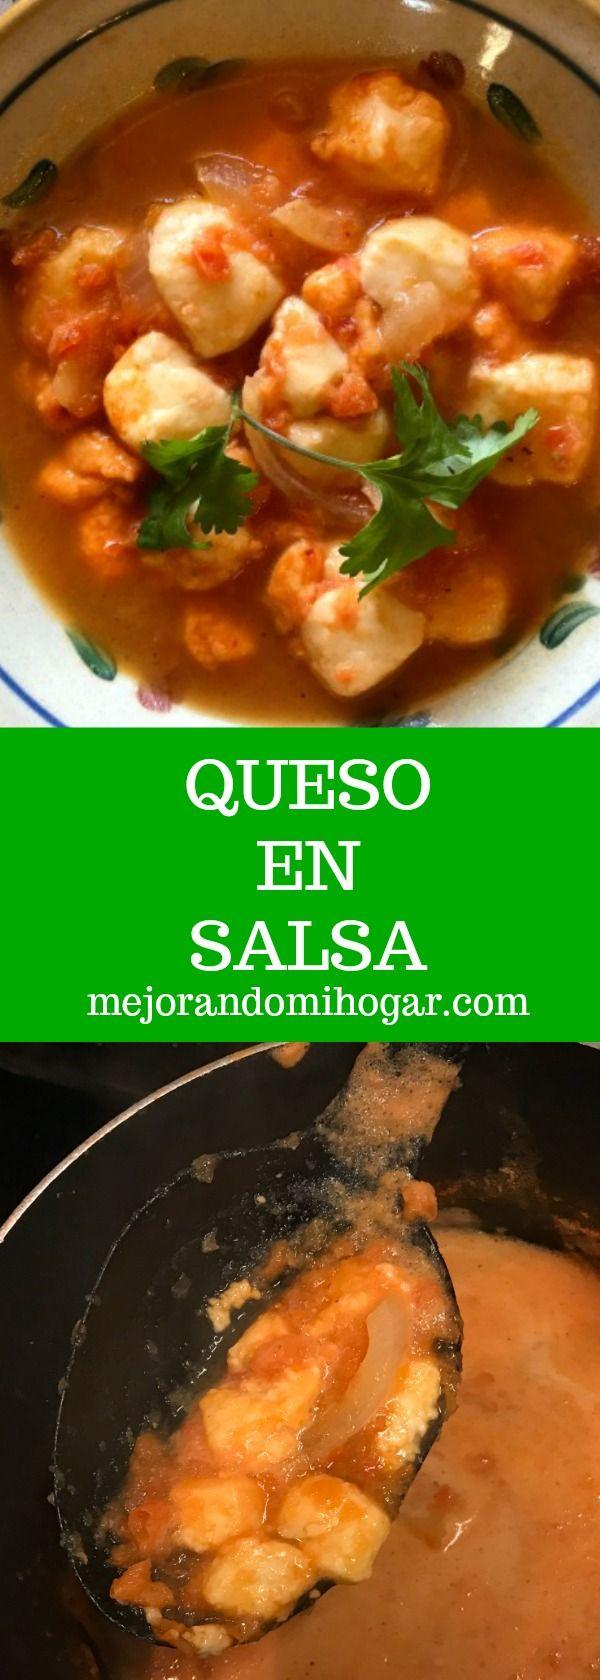 Queso en salsa ~ Receta mexicana muy facil!